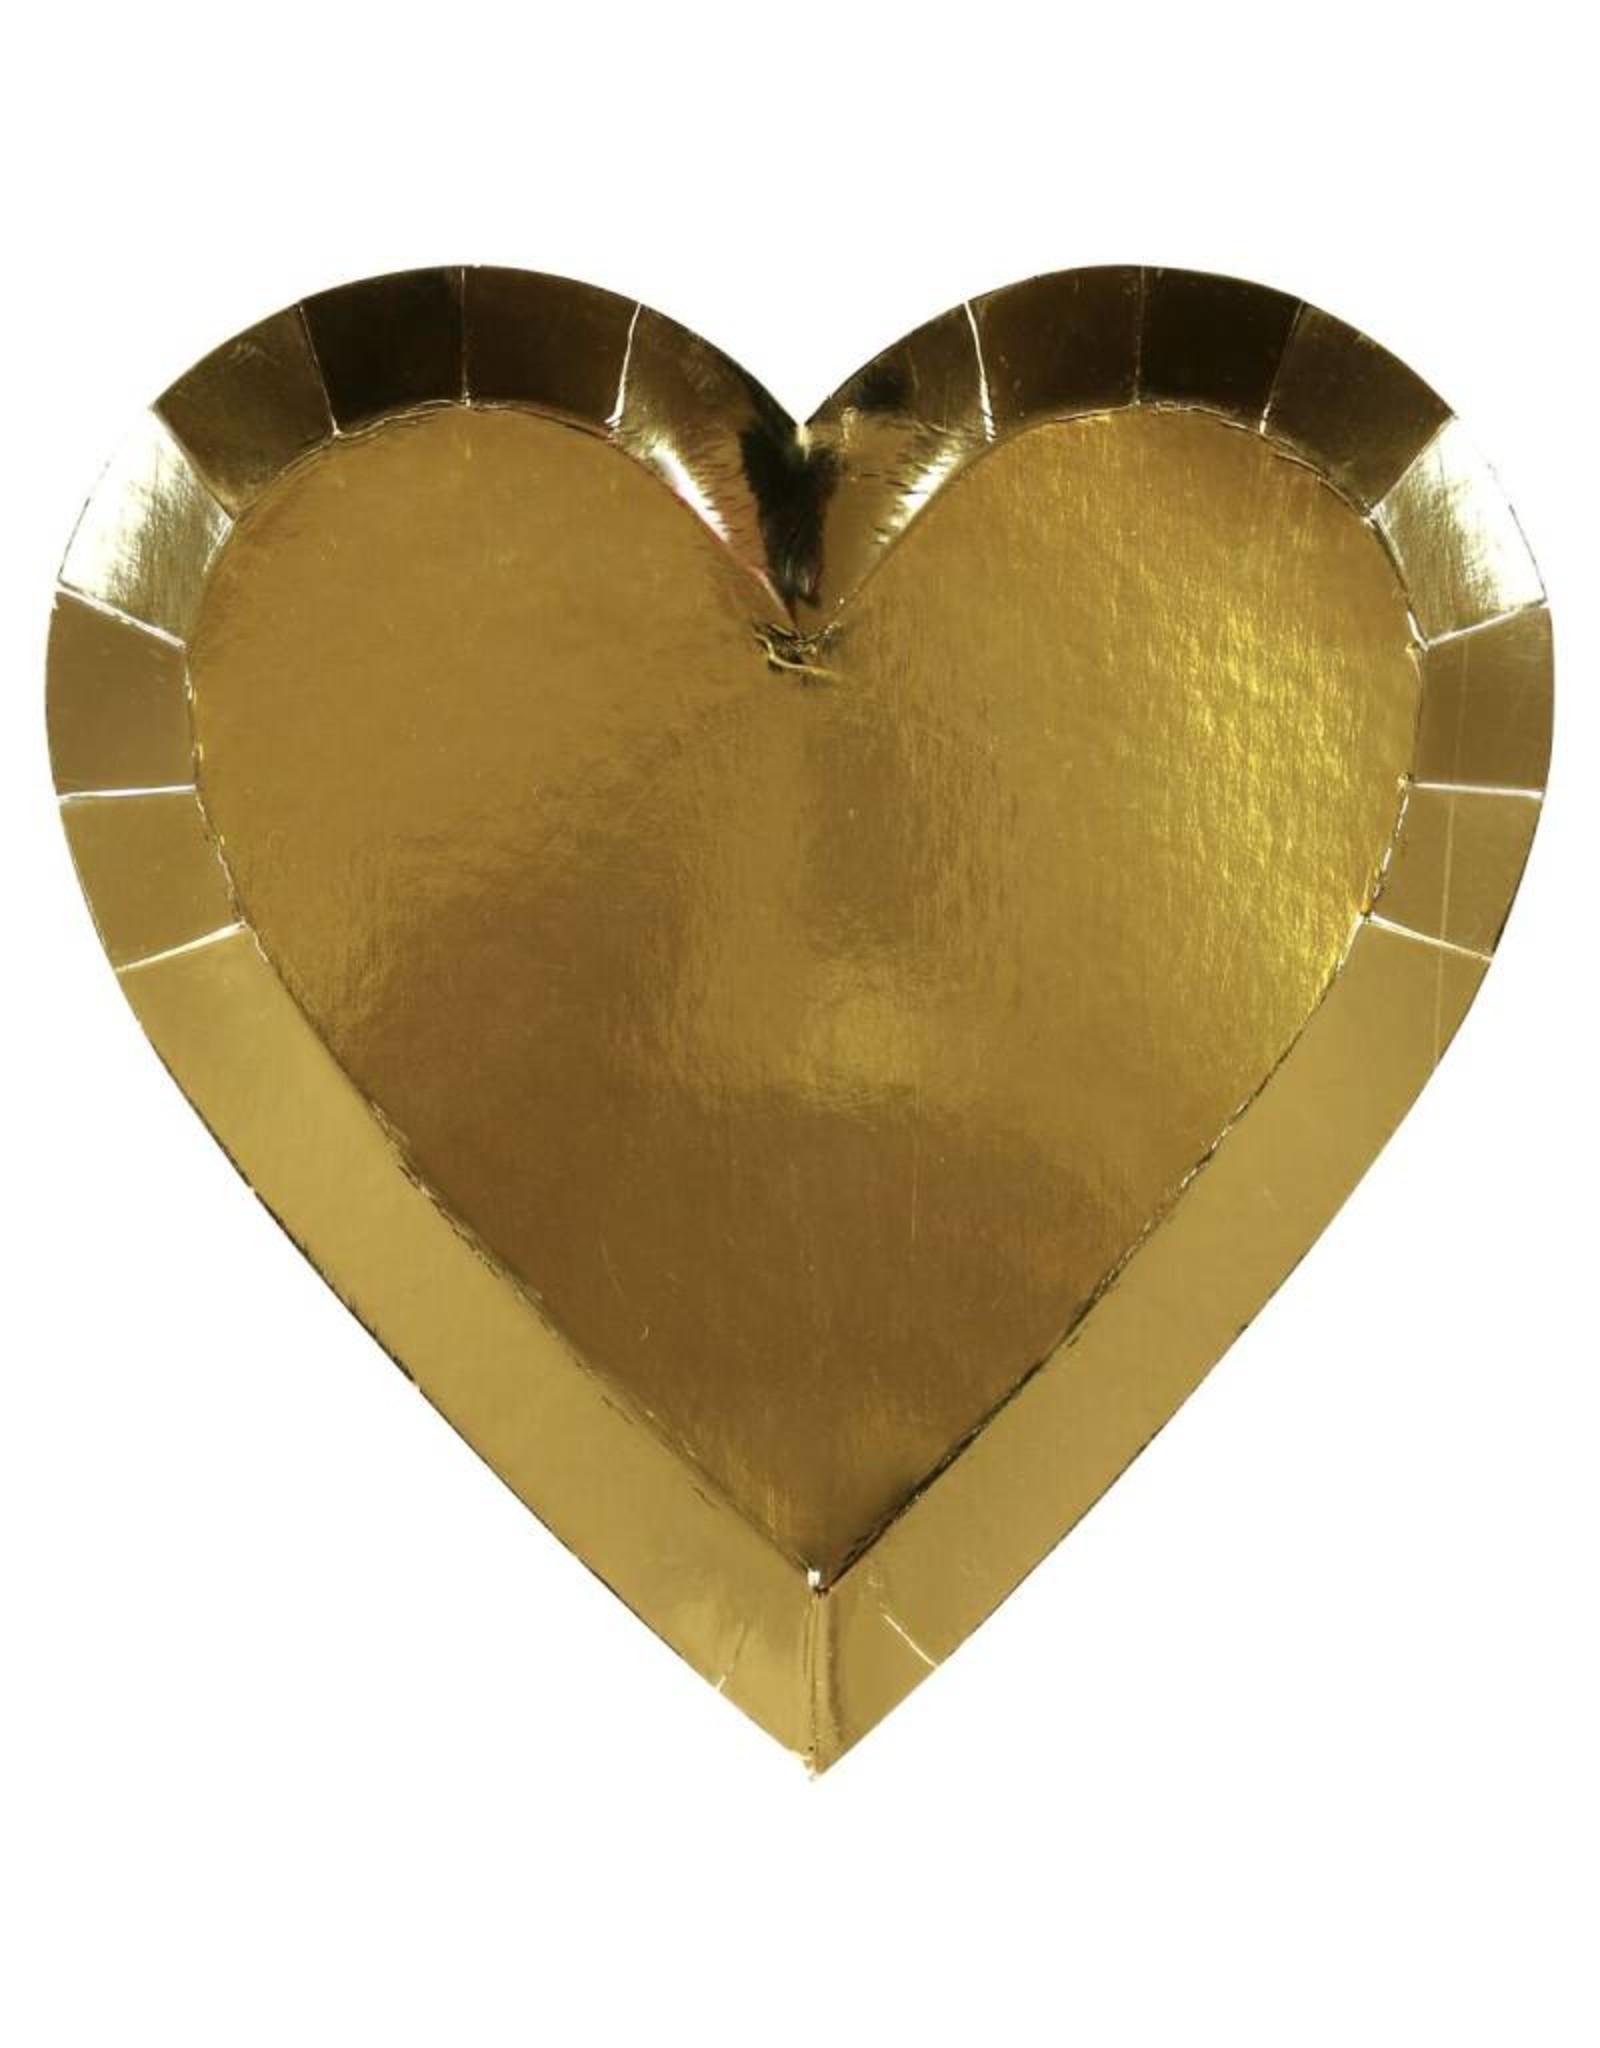 Meri Meri gold heart plates